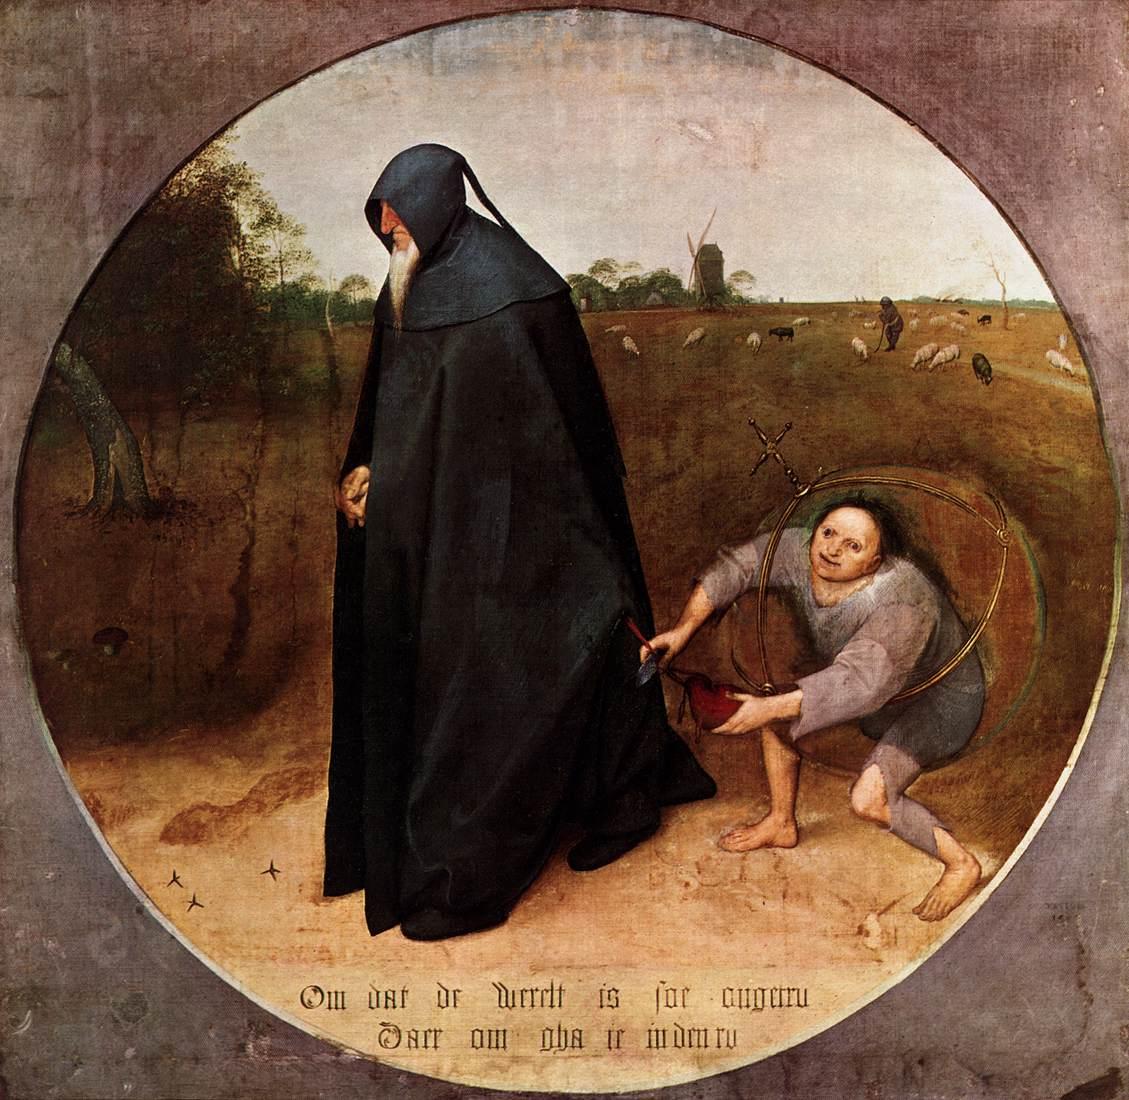 The Misanthrope (1568)